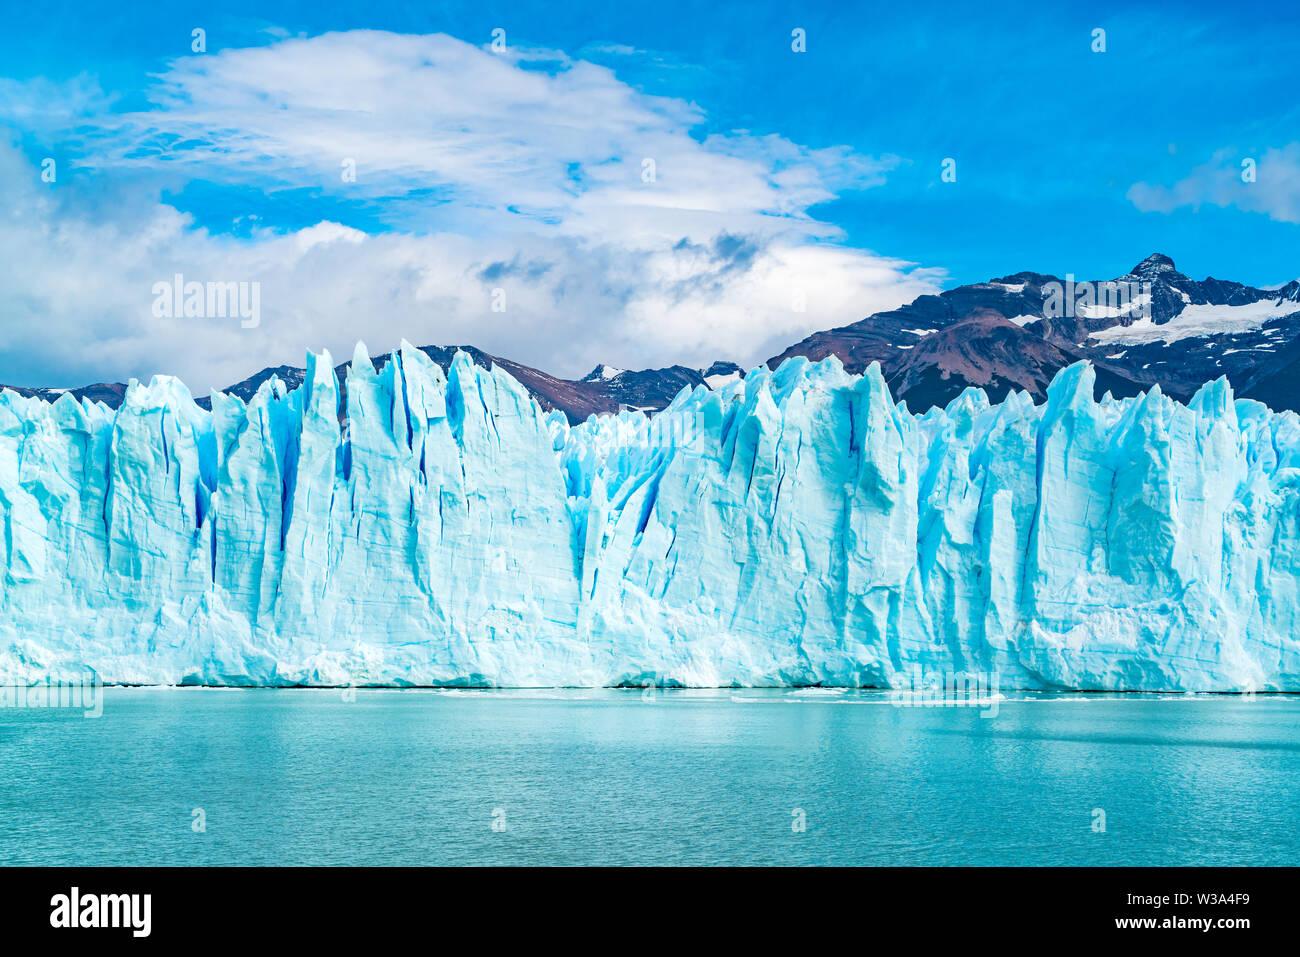 Blue Ice of Perito Moreno Glacier on Argentina Lake at Los Glaciares National Park in Argentina Patagonia - Stock Image